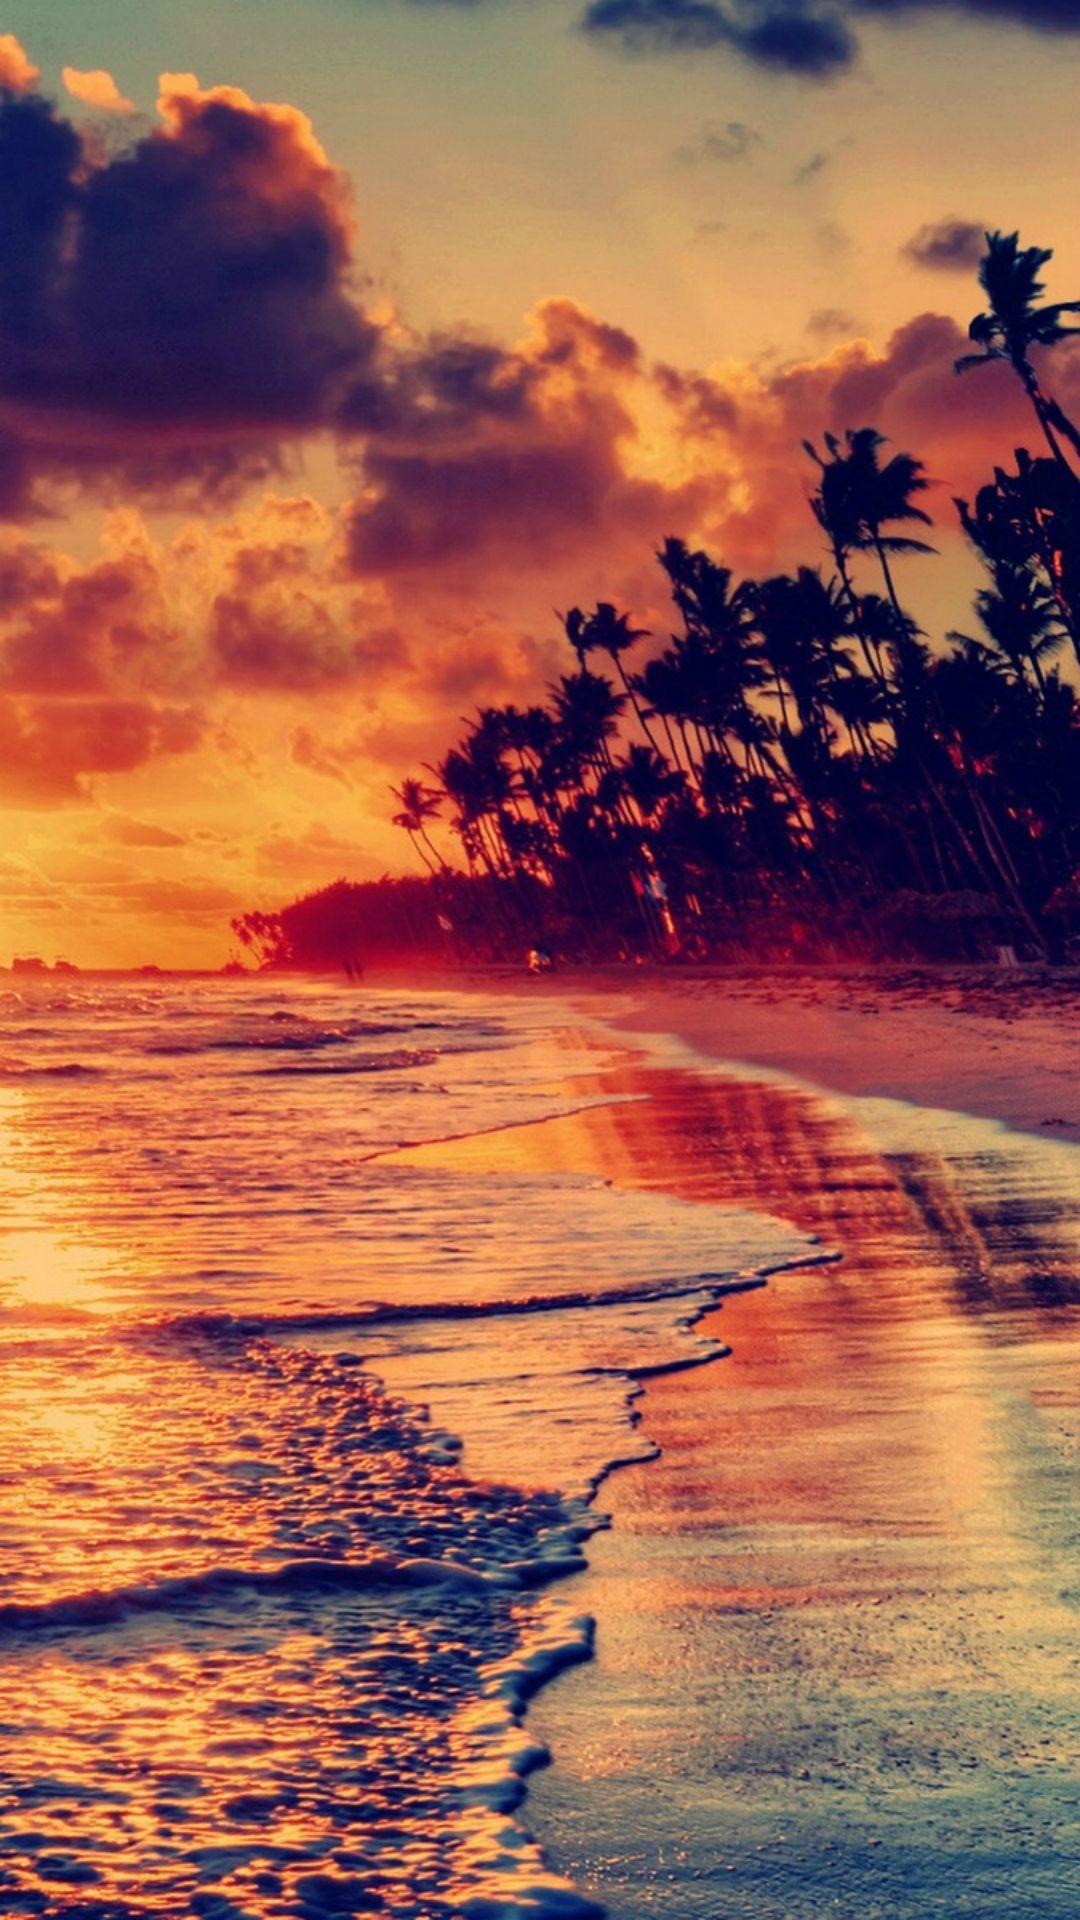 Nature-Fire-Sunset-Beach-iPhone-6-wallpaper. from godfatherstyle.com